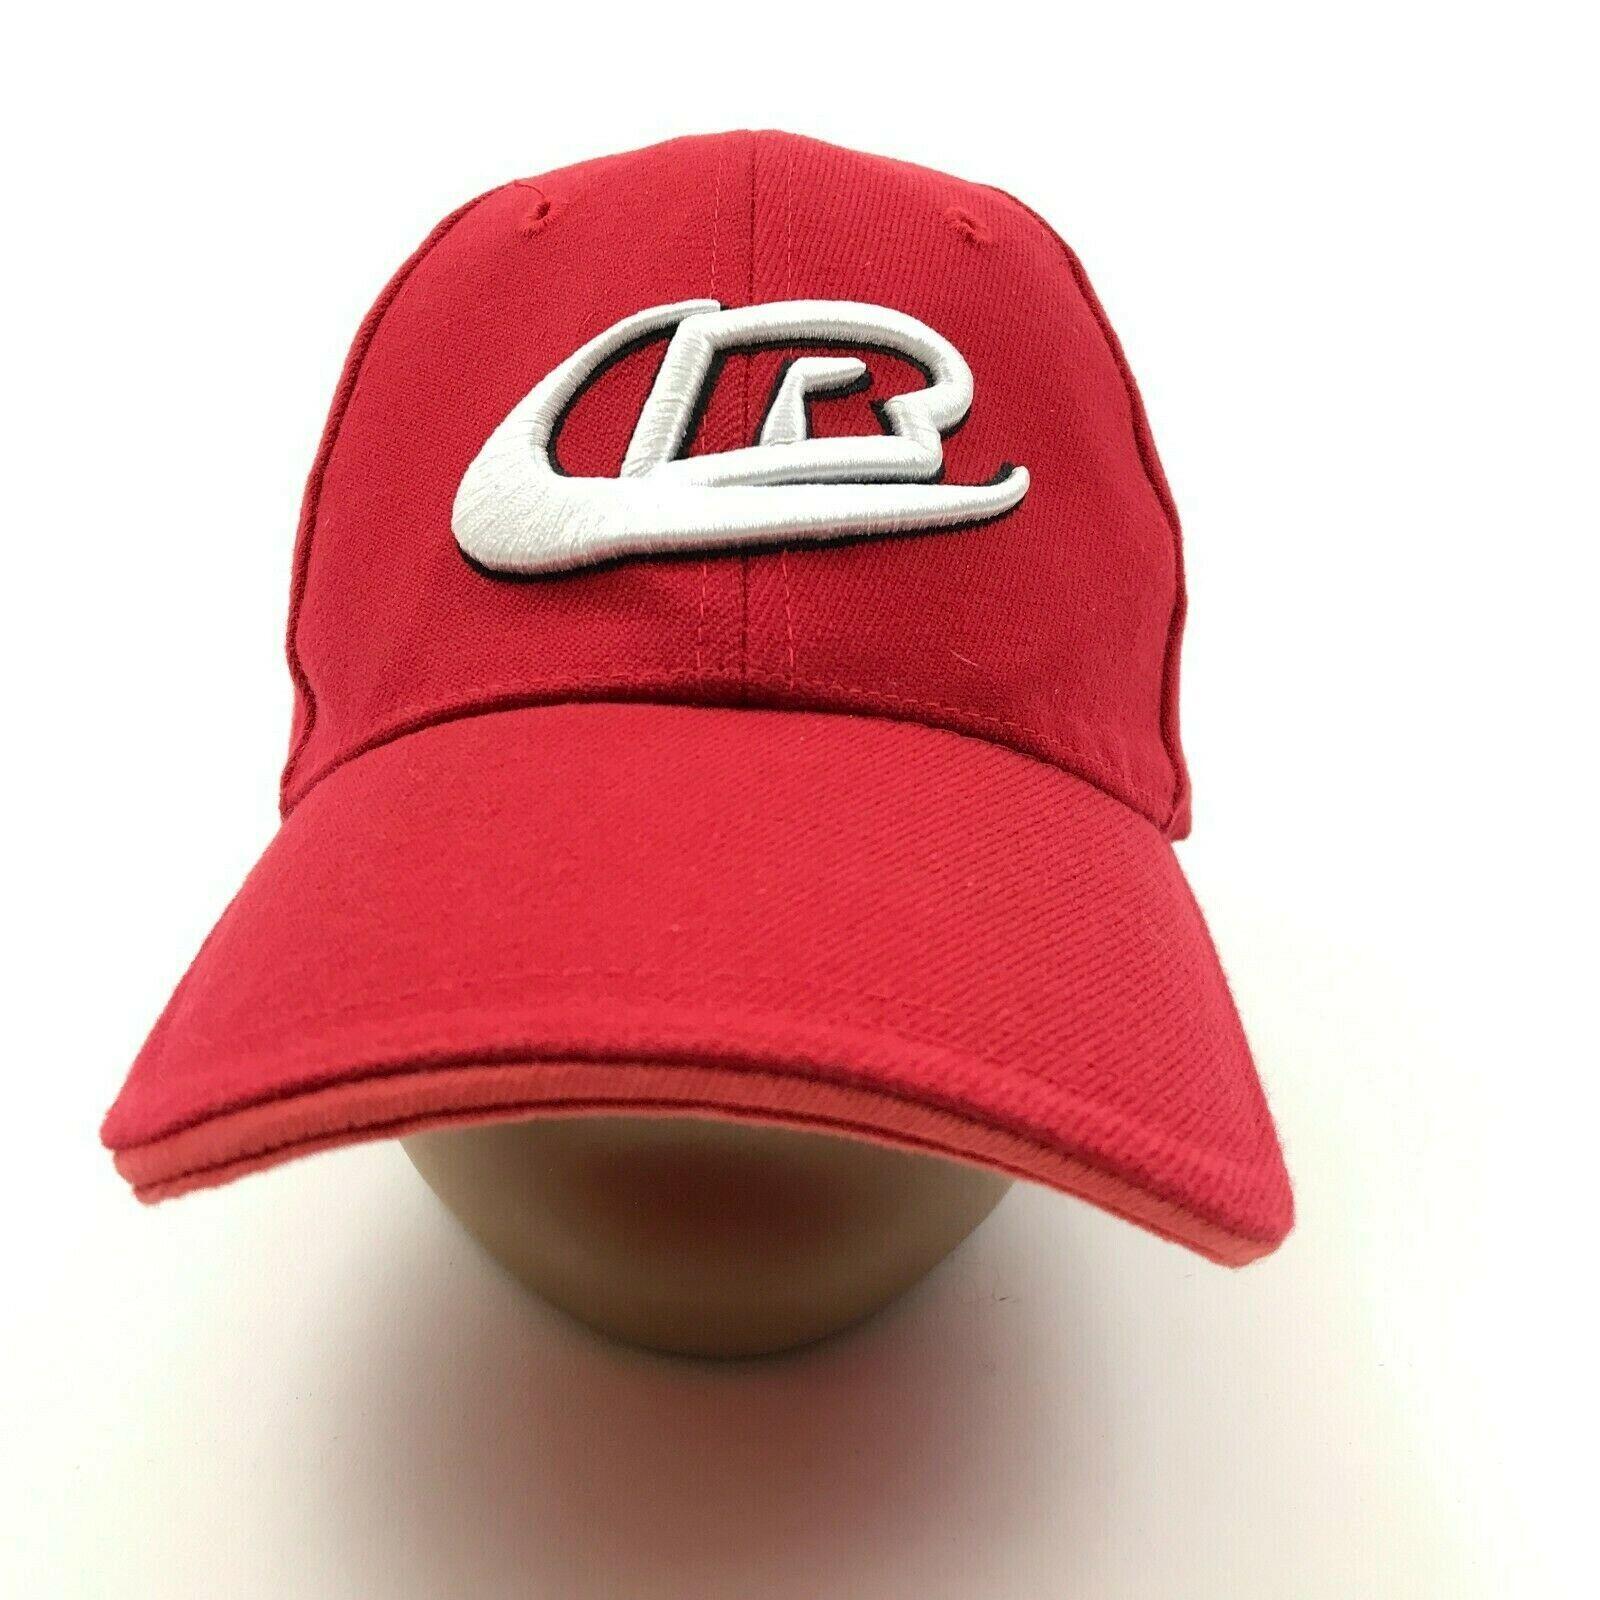 Ringers Handschuhe Hut Kappe Stretch Fit One Größe Rot Weiß Herren Bestickt Nhra